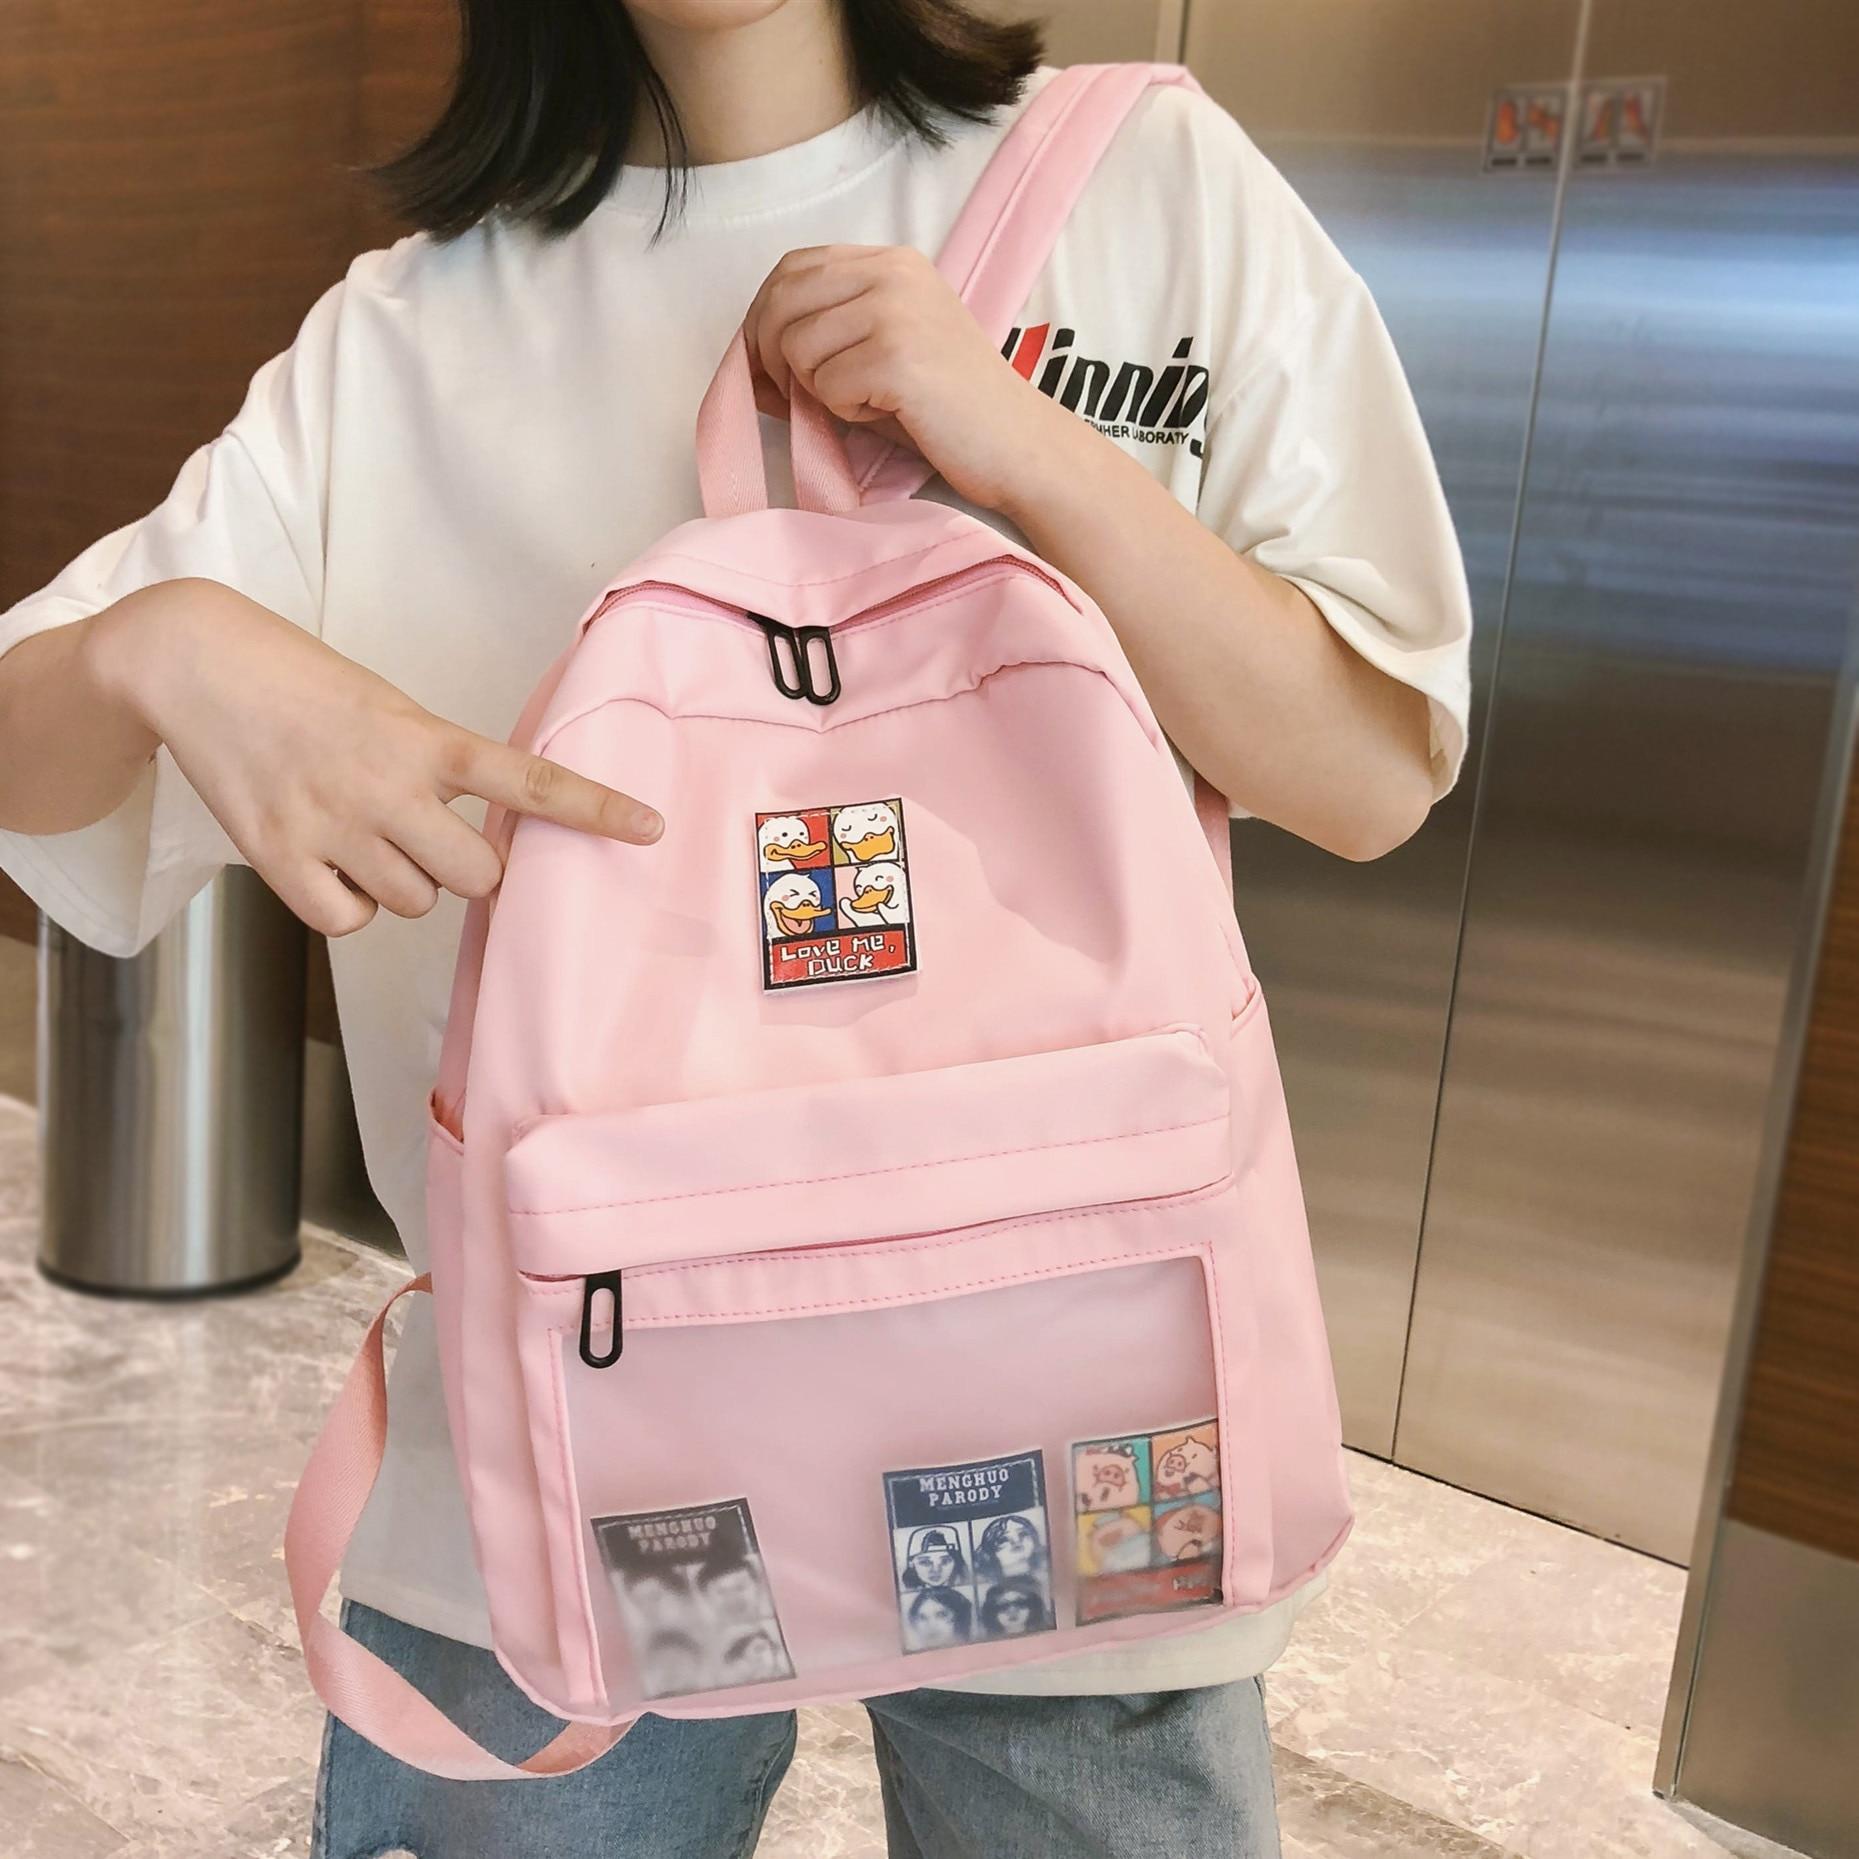 Fashion Women Backpack Nylon Waterproof Cute Label Girls Leisure Bookbag Female Travel Bag  For College Girls Backpack Mochilas